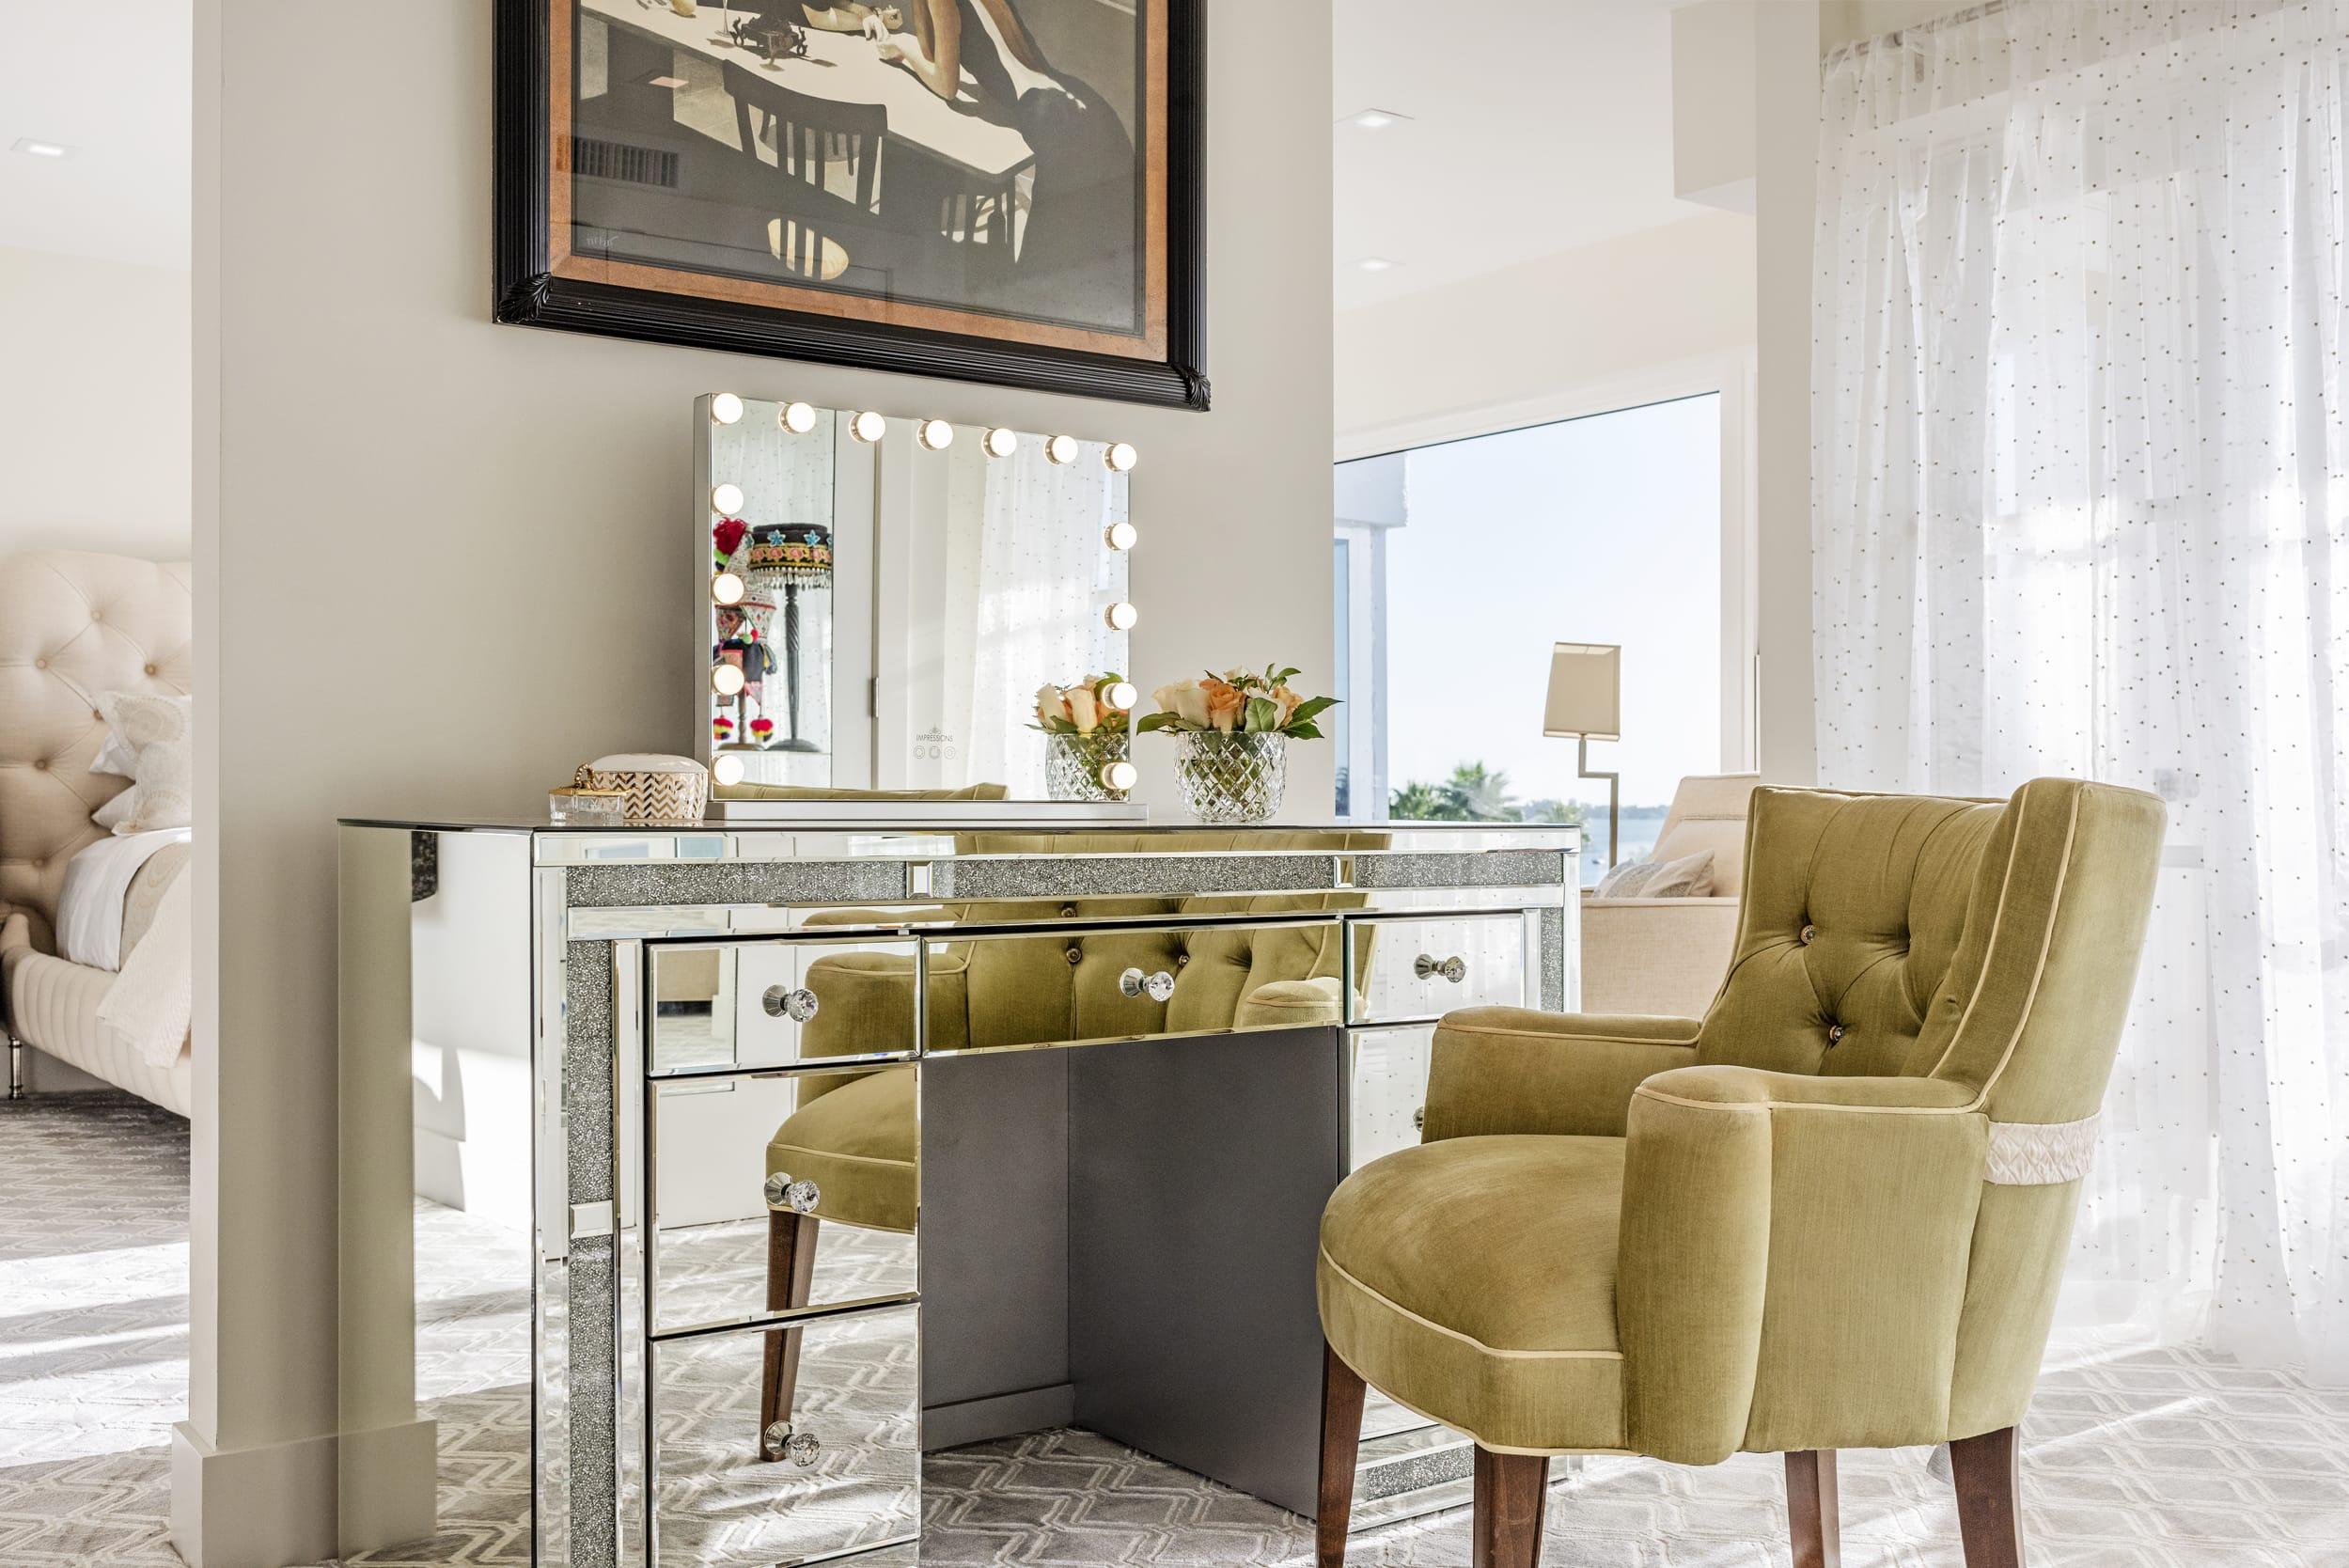 Reflective Vanity Powder Room Pea Green Arm Chair Mirror